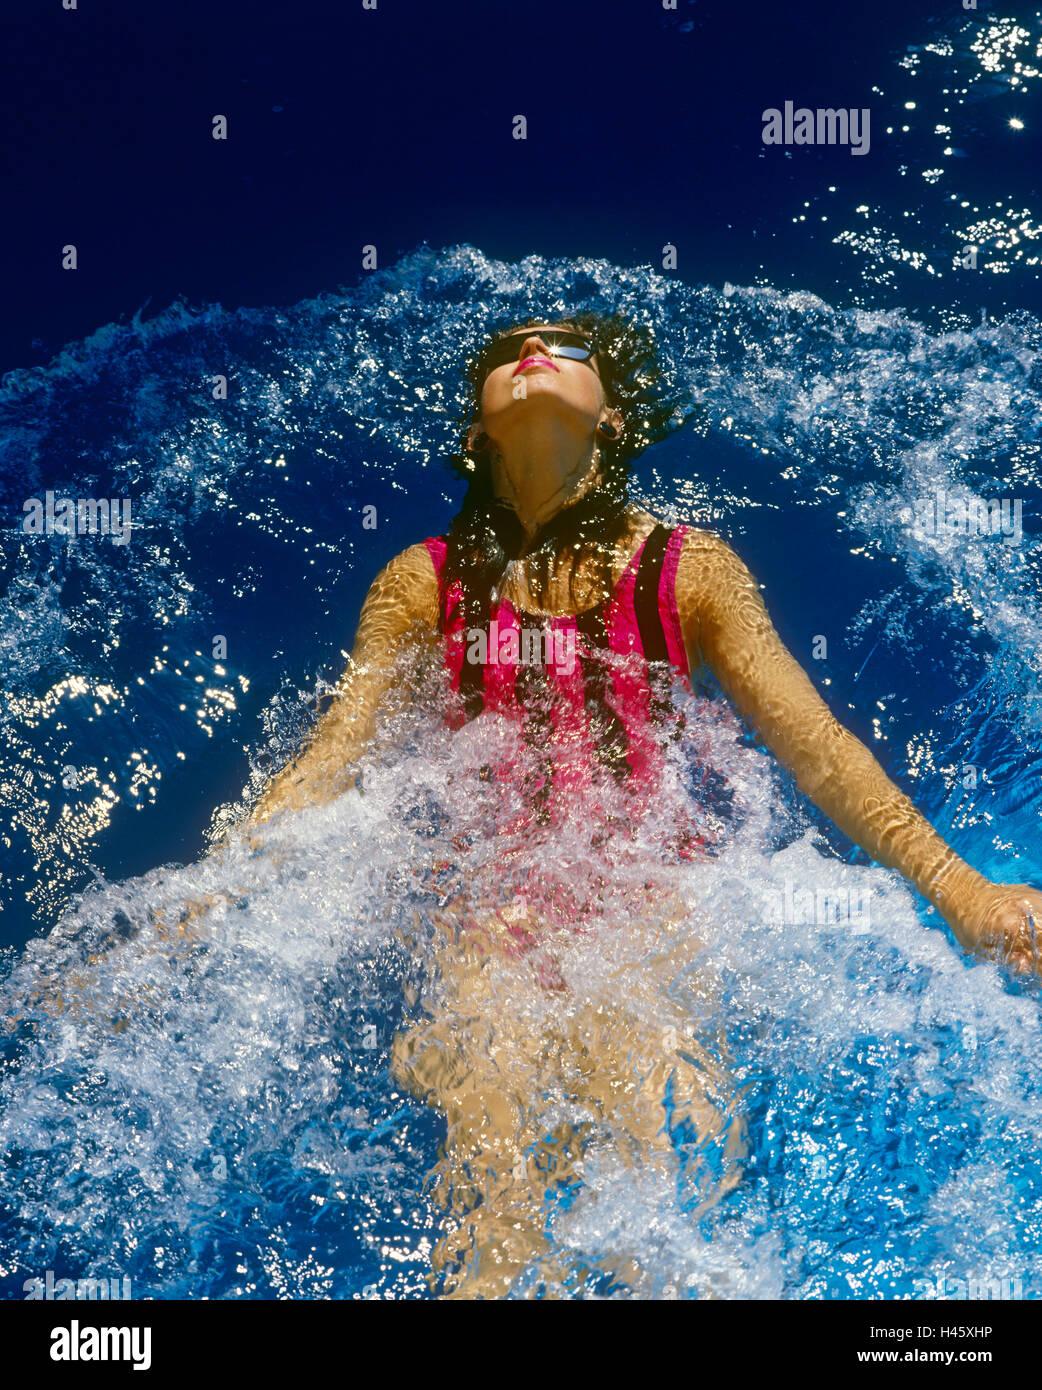 Girl swimming in pool Photo Stock